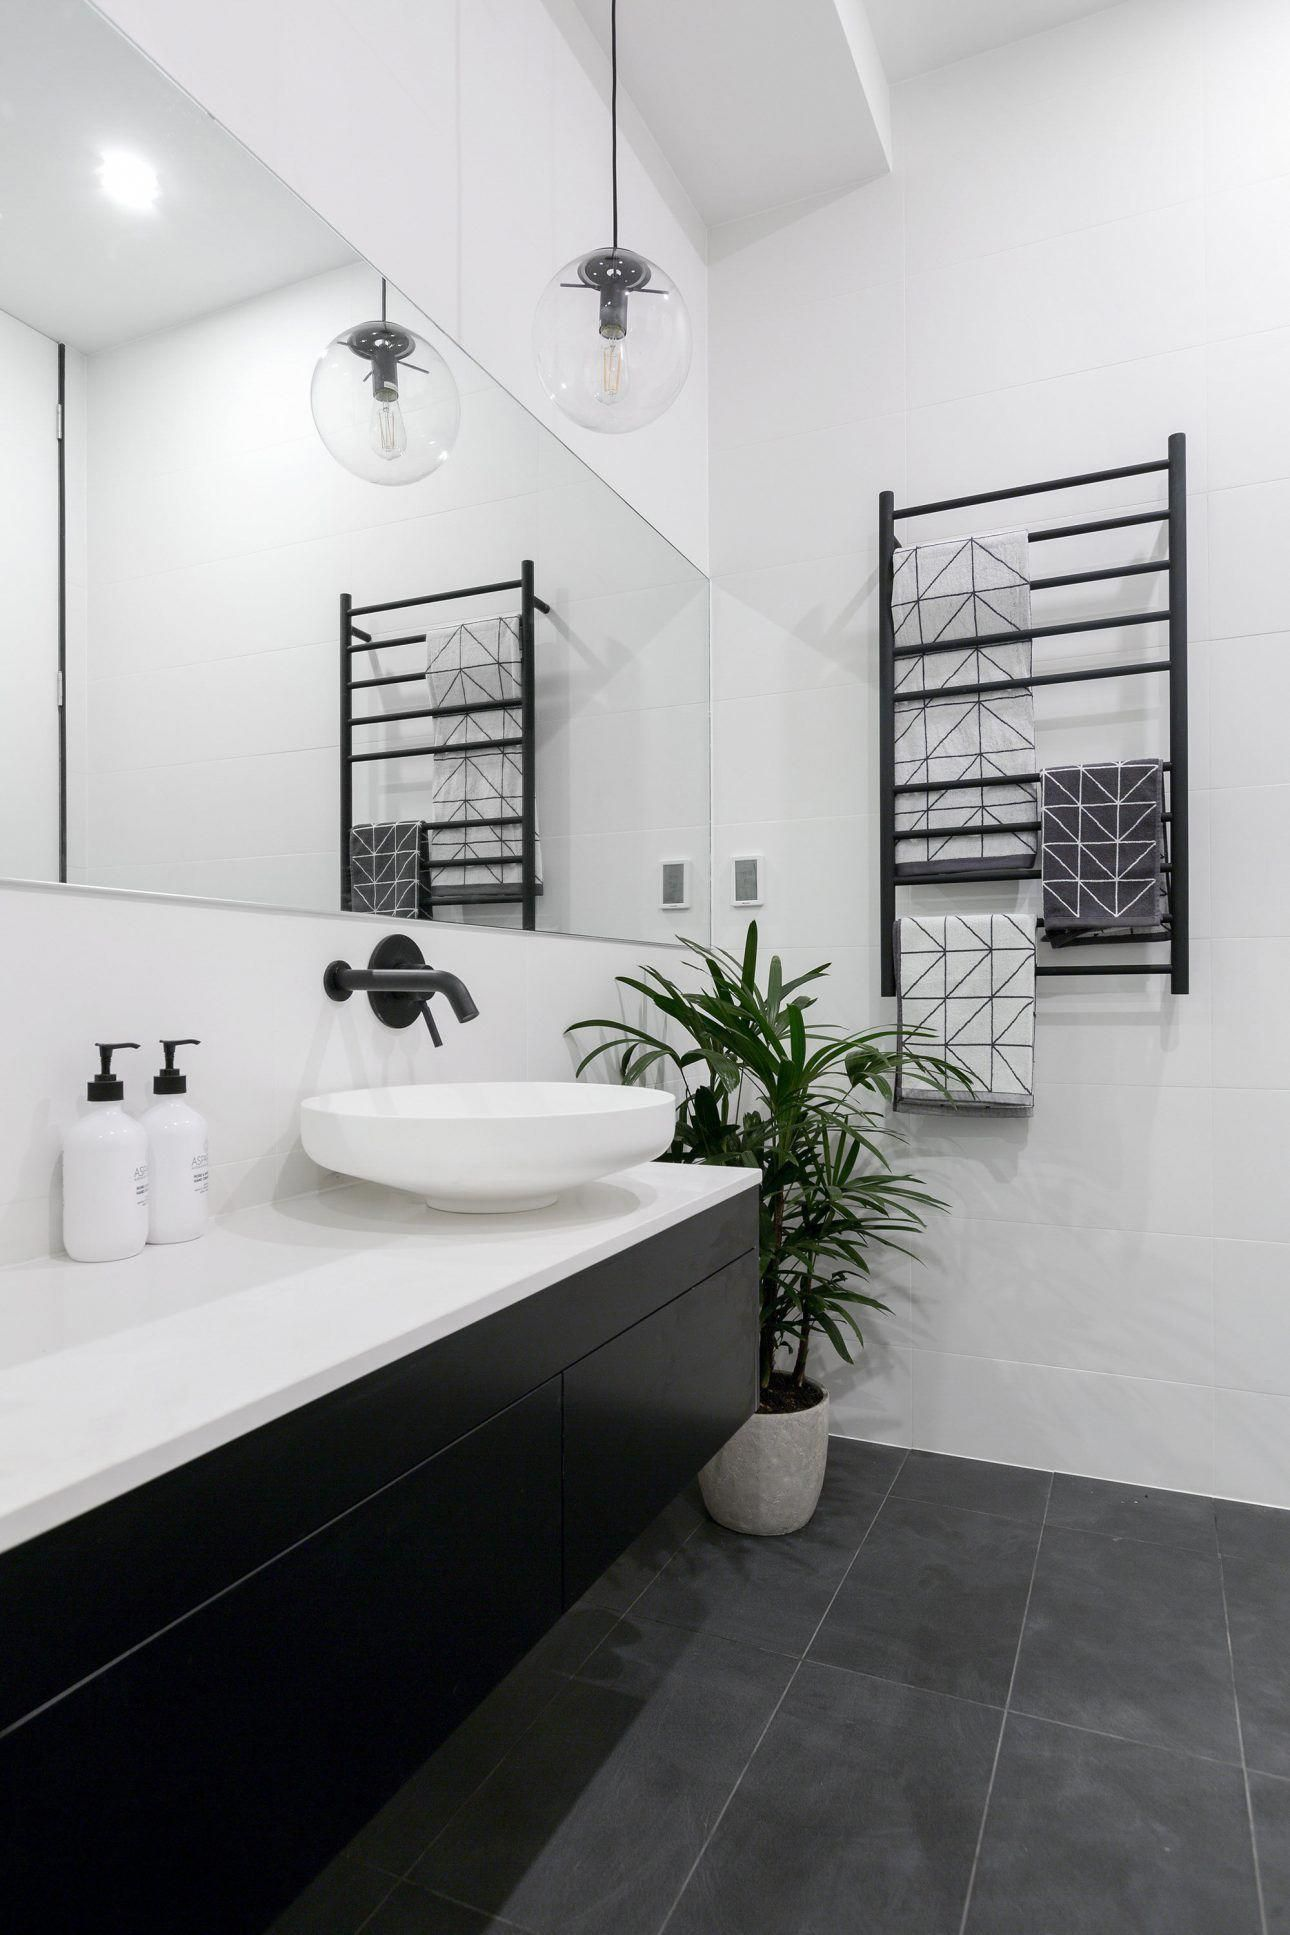 Todayus standard designs of bathroom furnishings are sporting